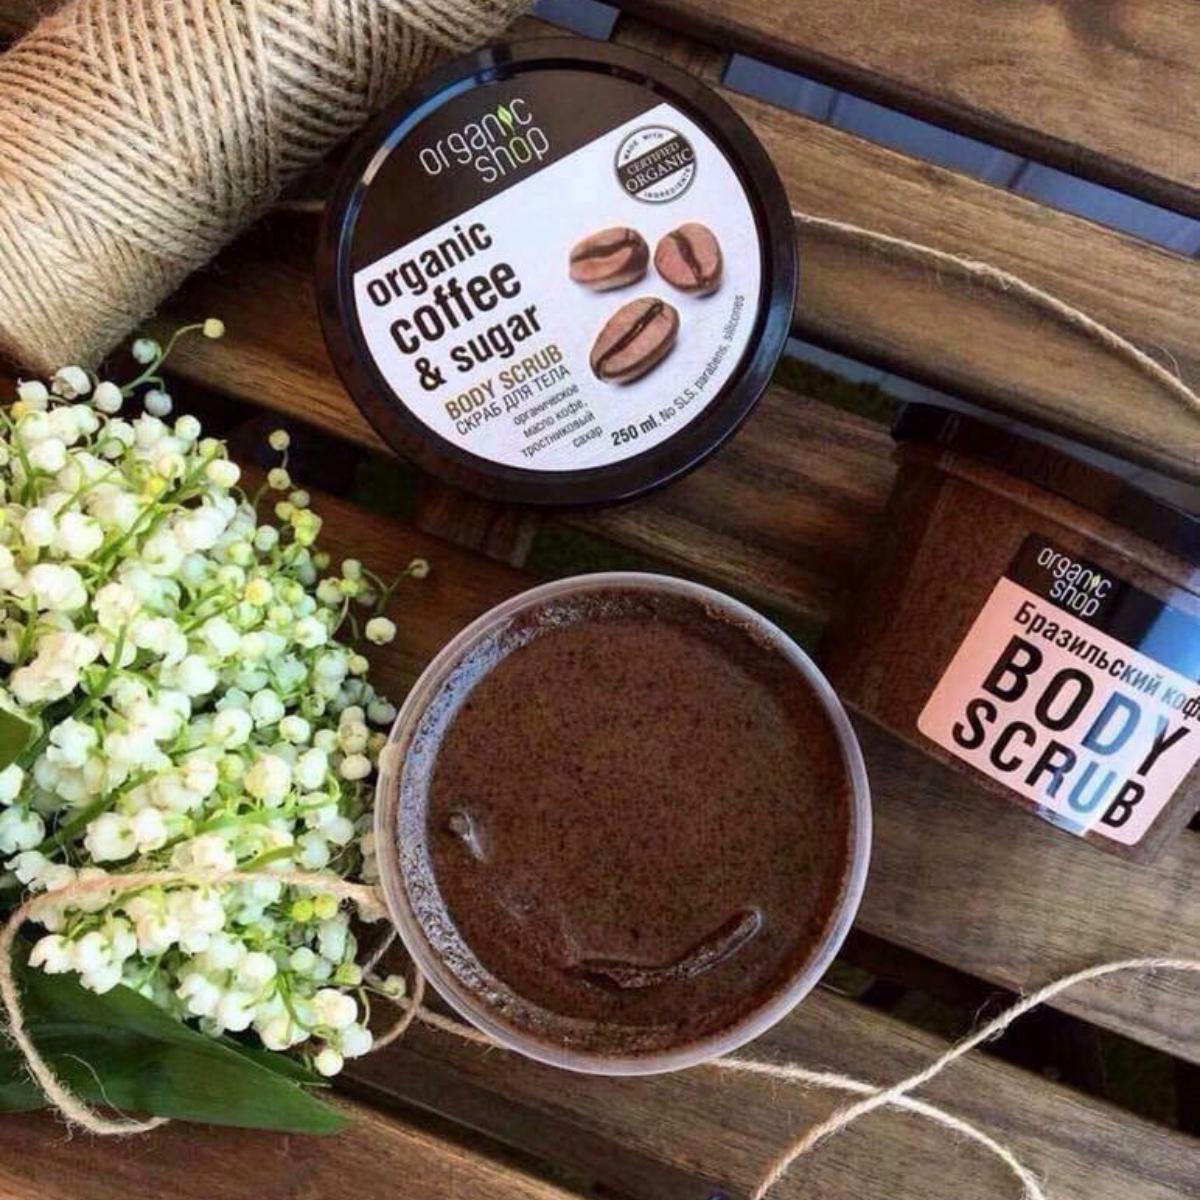 tay-te-bao-chet-toan-than-organic-shop-organic-coffee-amp-sugar-body-scrub-250ml-726898j4442.jpg